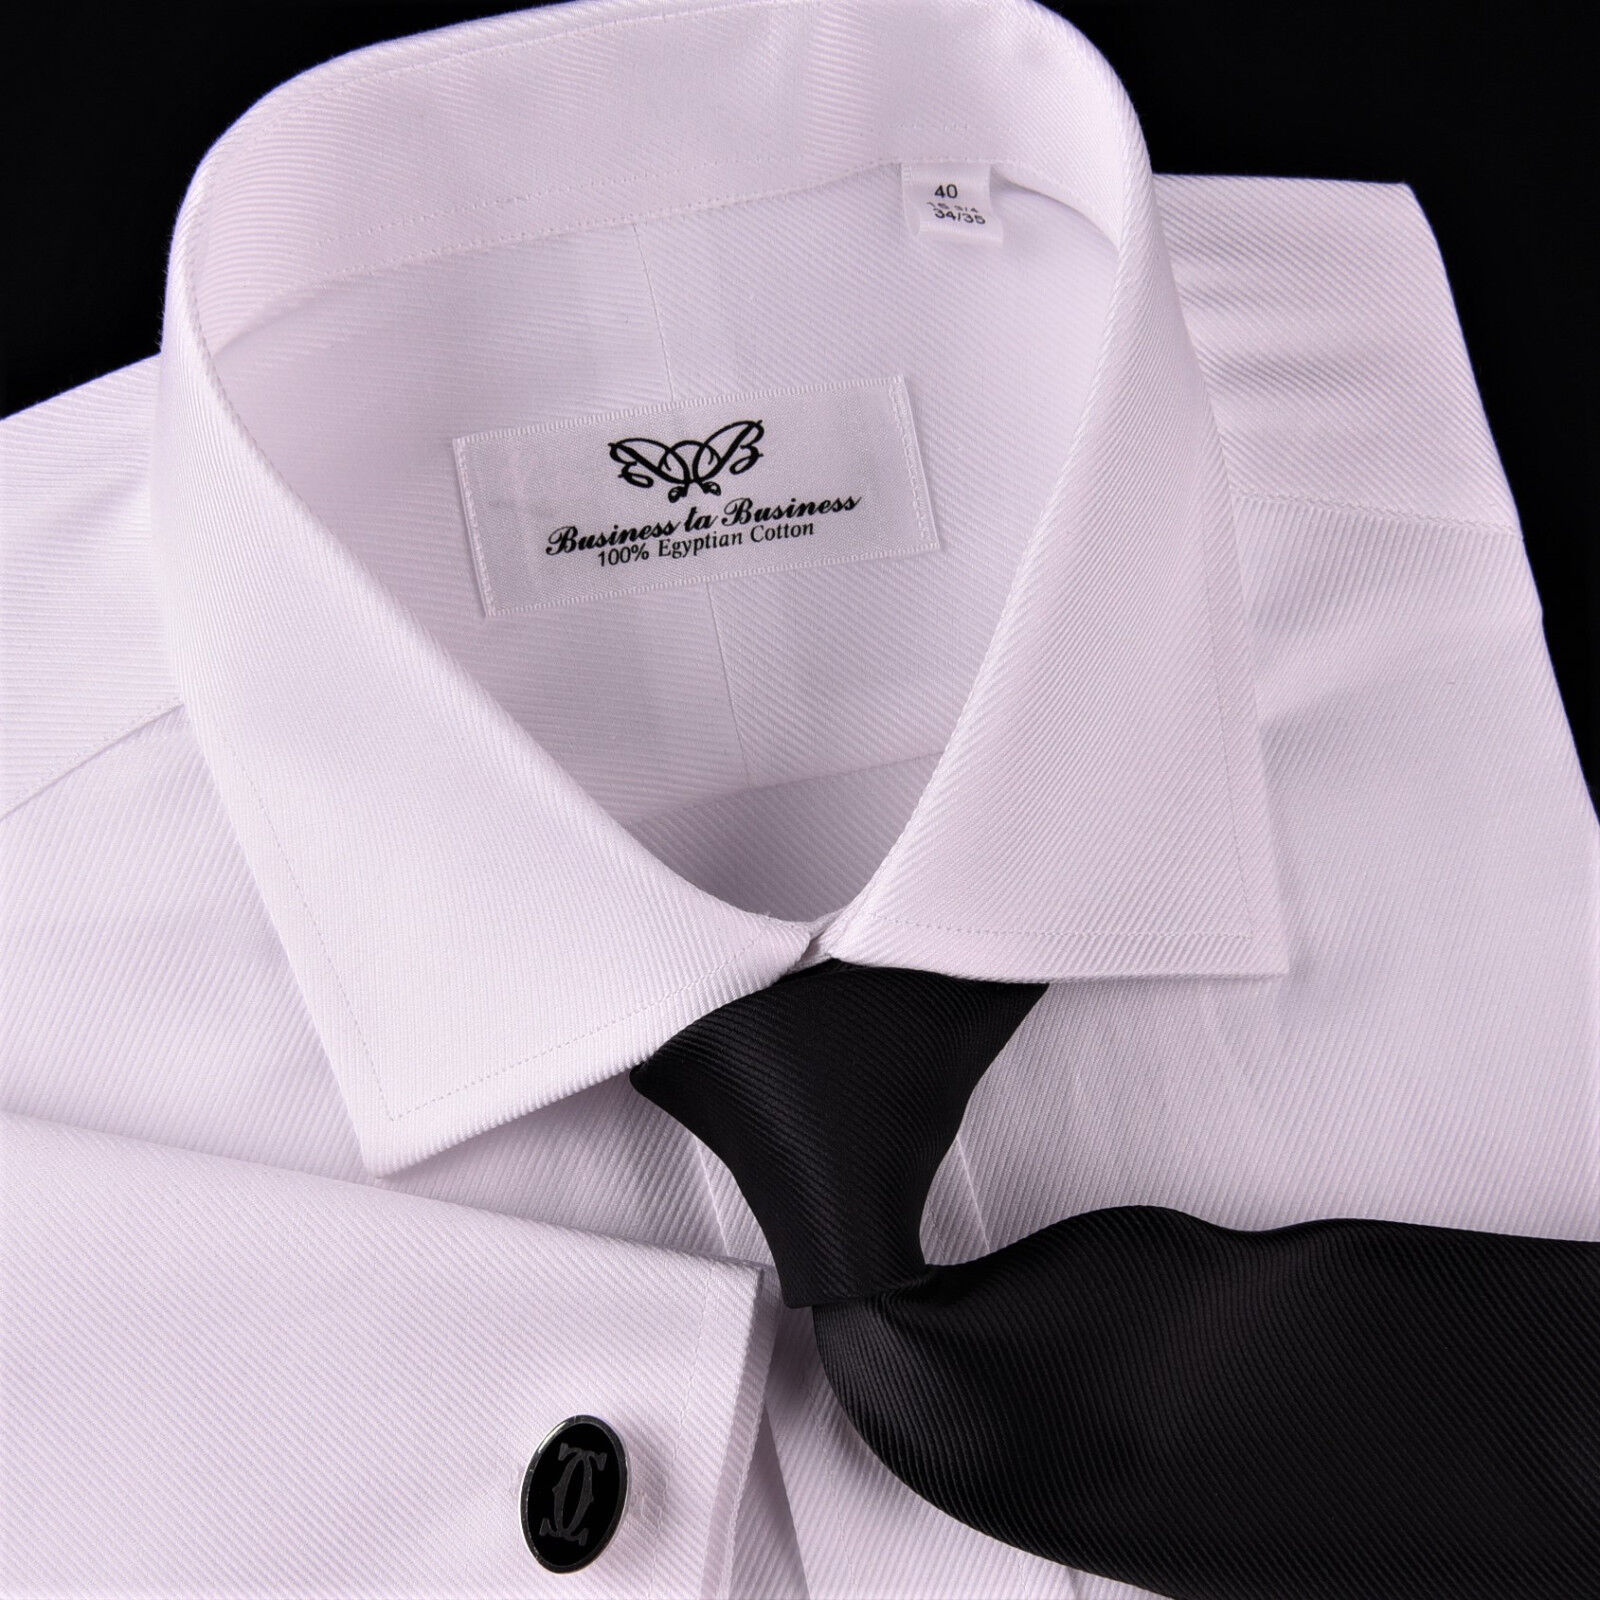 Weiß Twill Formal Dress Shirt Egyptian Cotton Formal Geschäft Sexy Luxury Weave